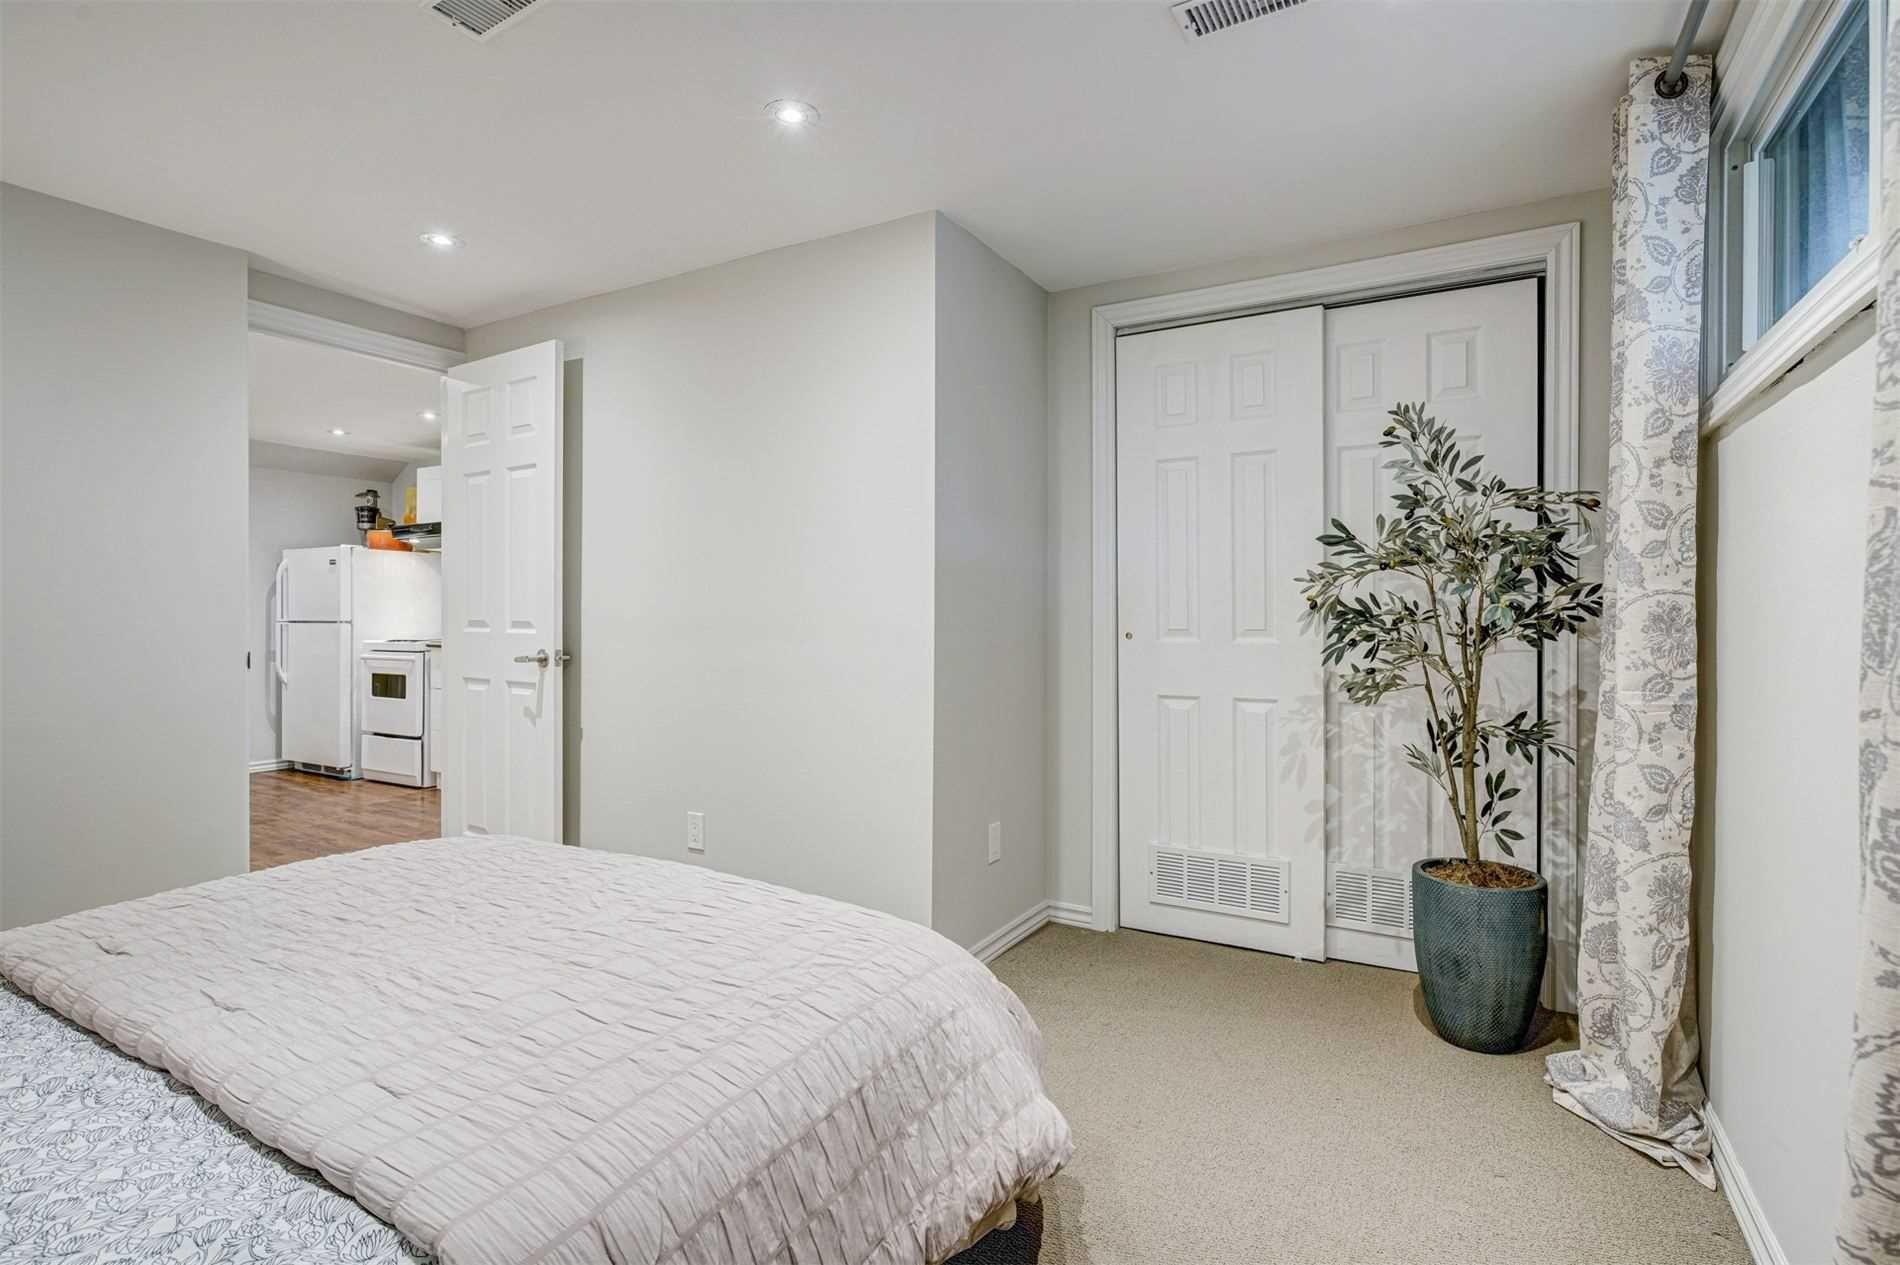 Photo 28: Photos: 92 Holborne Avenue in Toronto: Danforth Village-East York House (2-Storey) for sale (Toronto E03)  : MLS®# E5204452